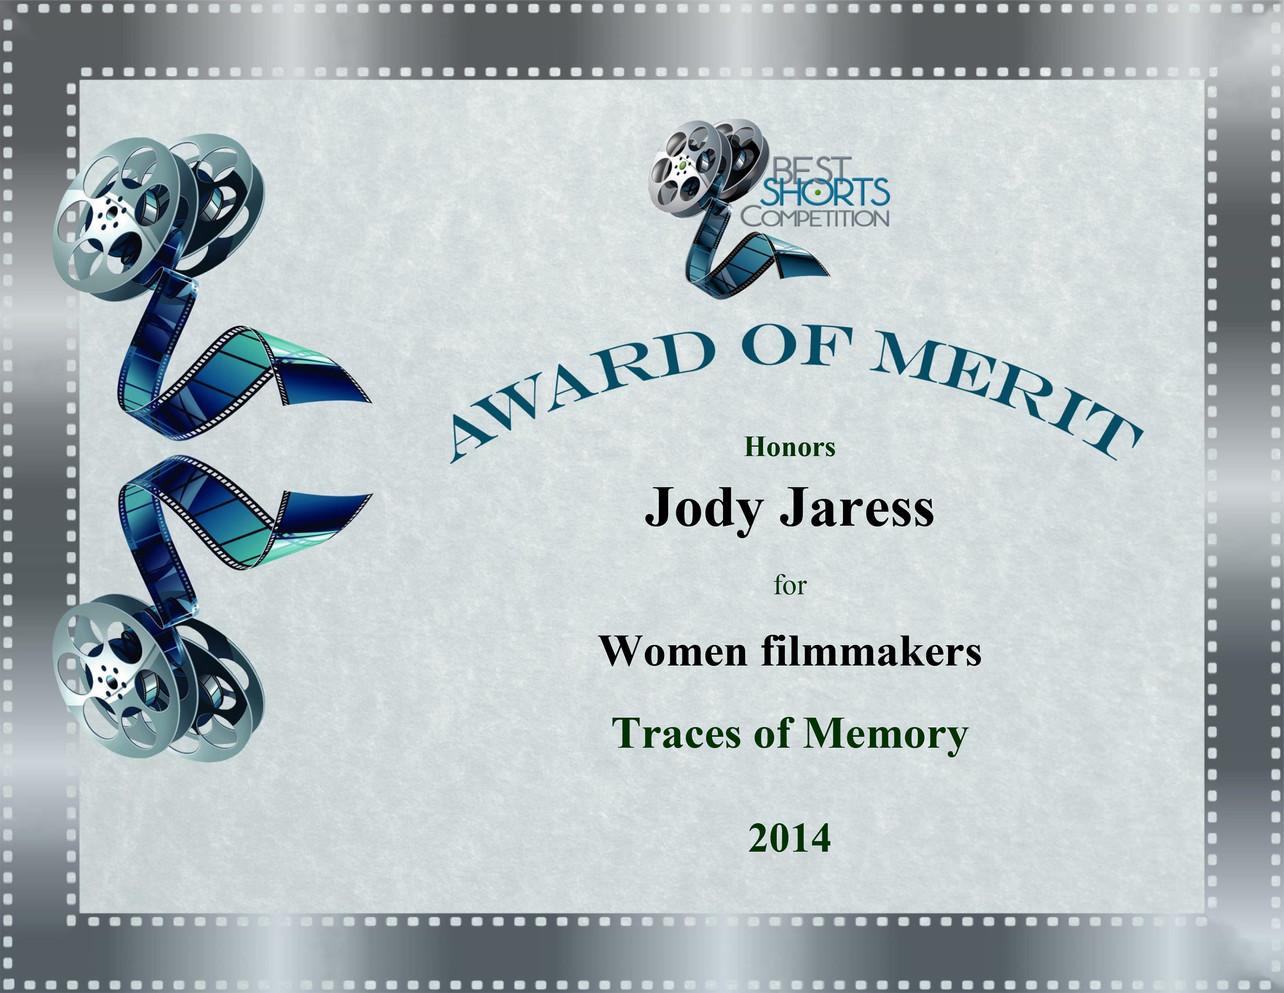 Jody+Jaress%2C+Best+Shorts+Award+of+Meri